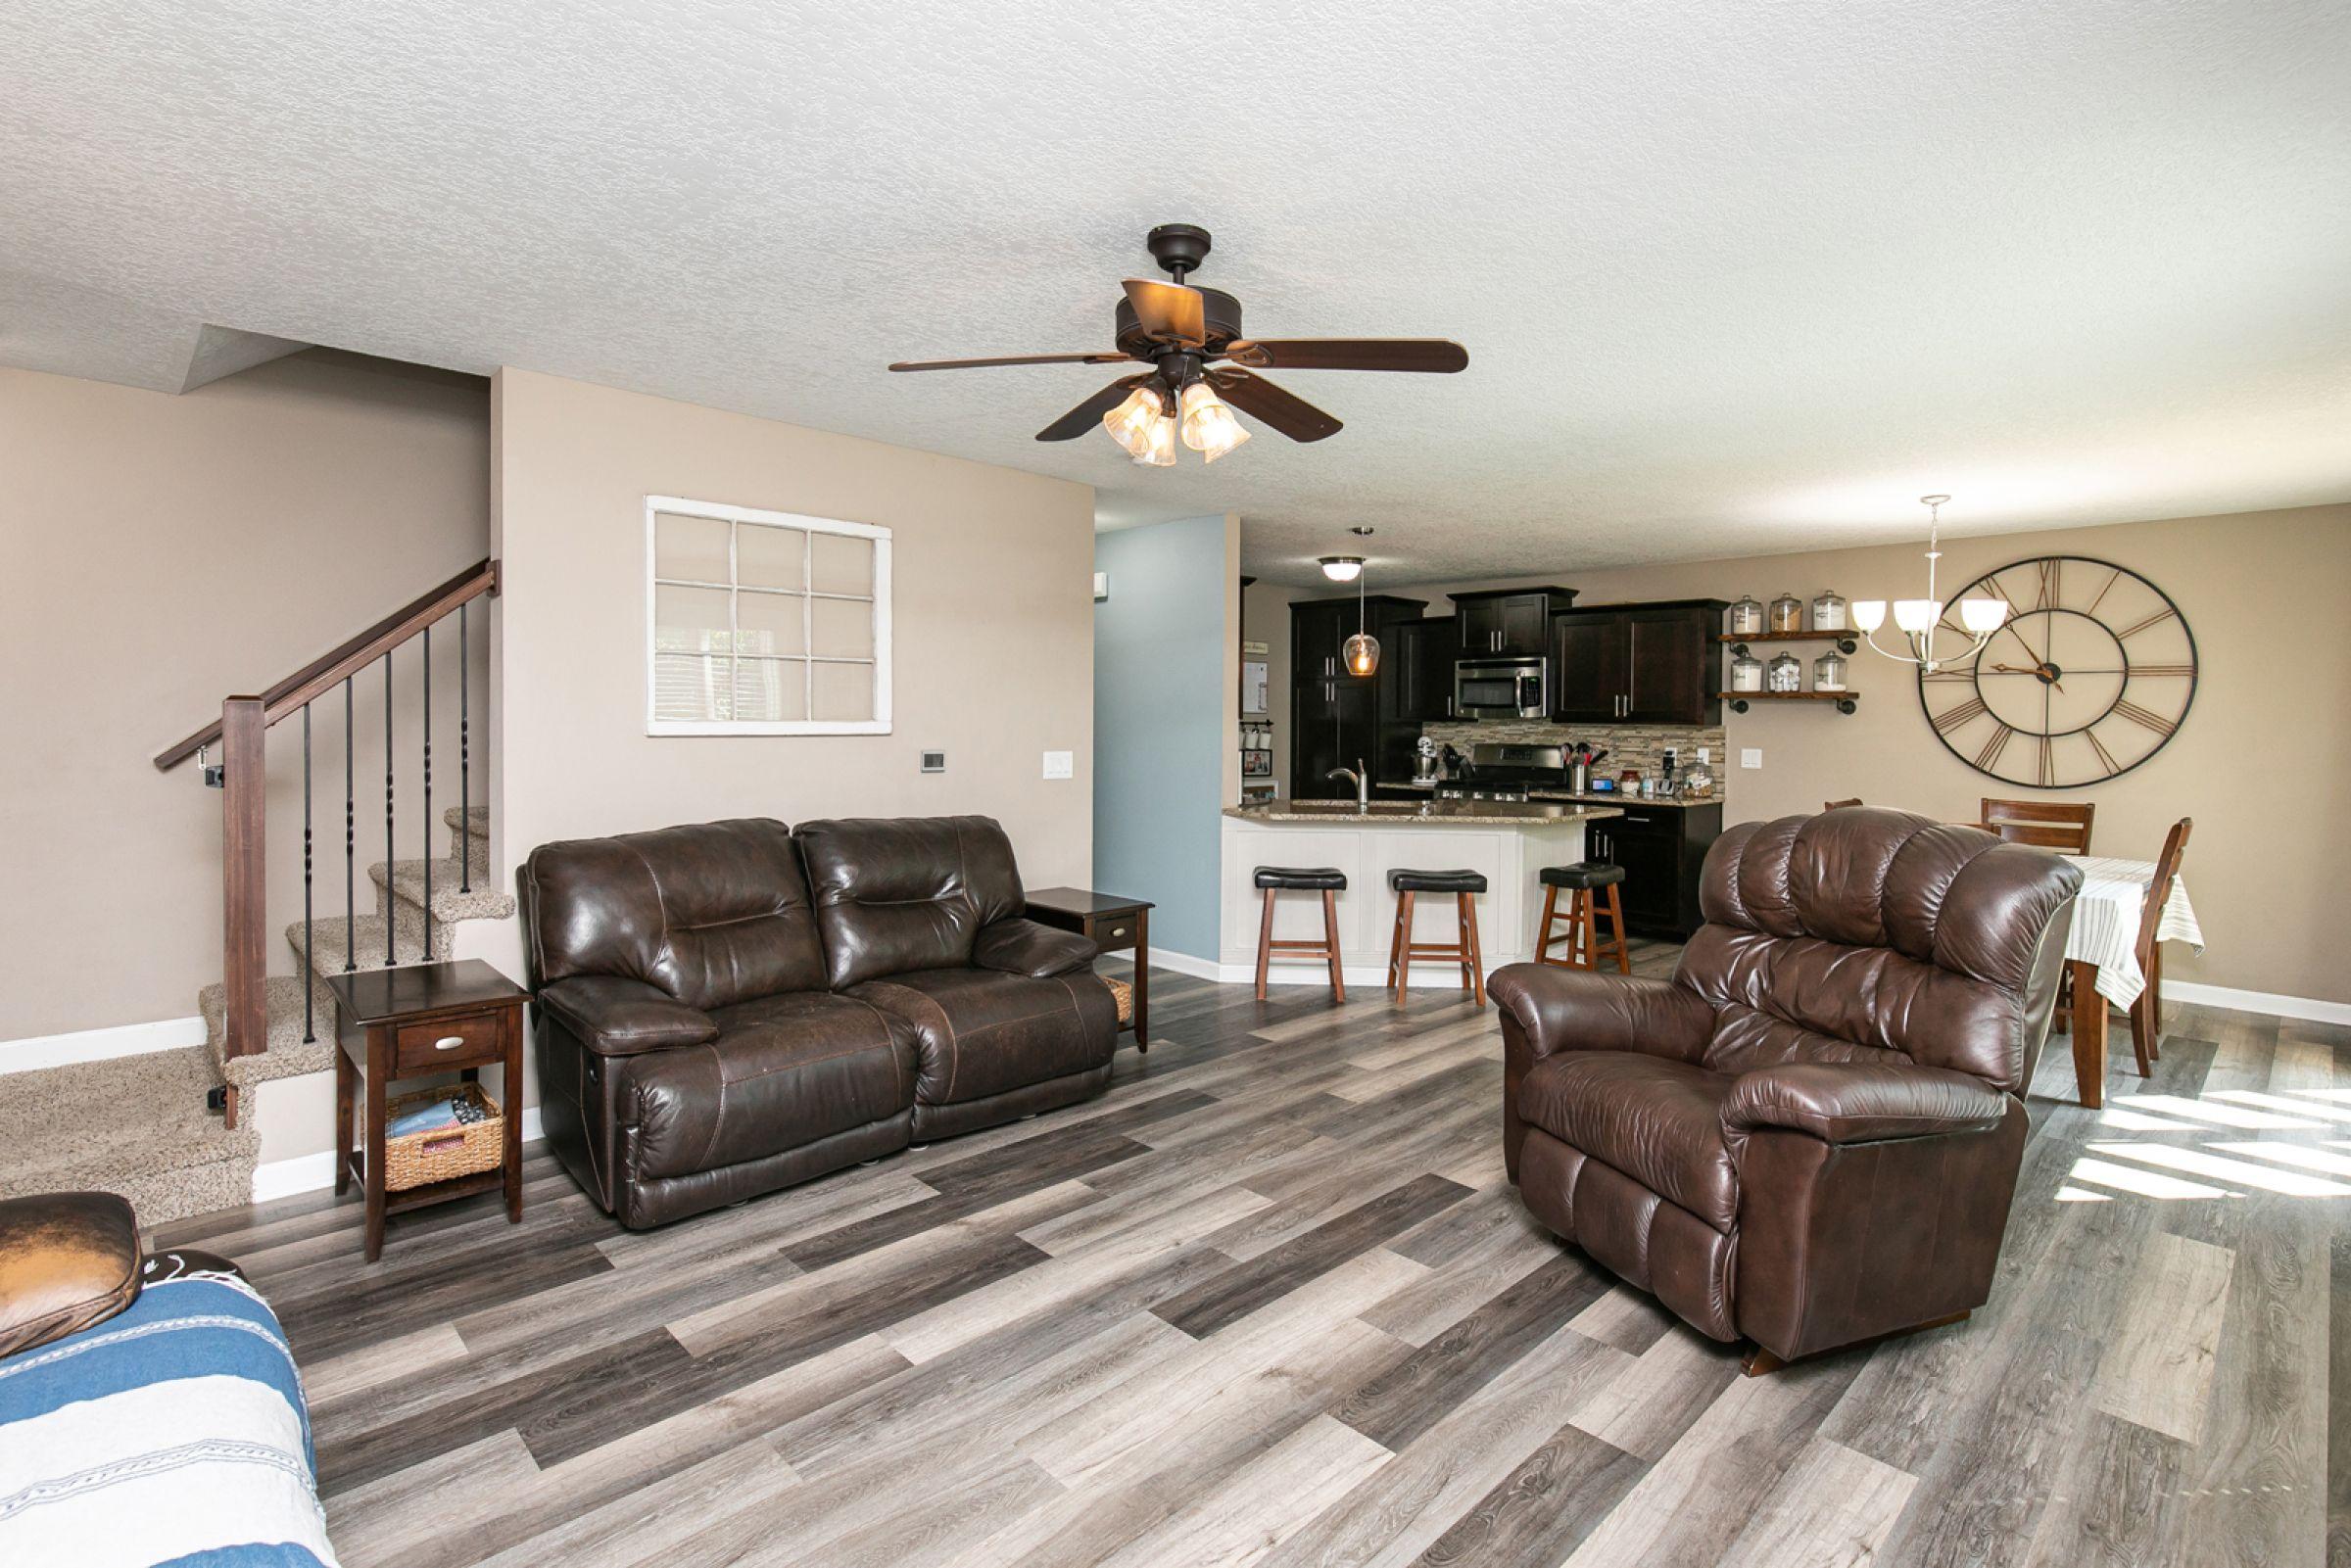 residential-warren-county-iowa-0-acres-listing-number-15685-2-2021-08-31-032155.jpg